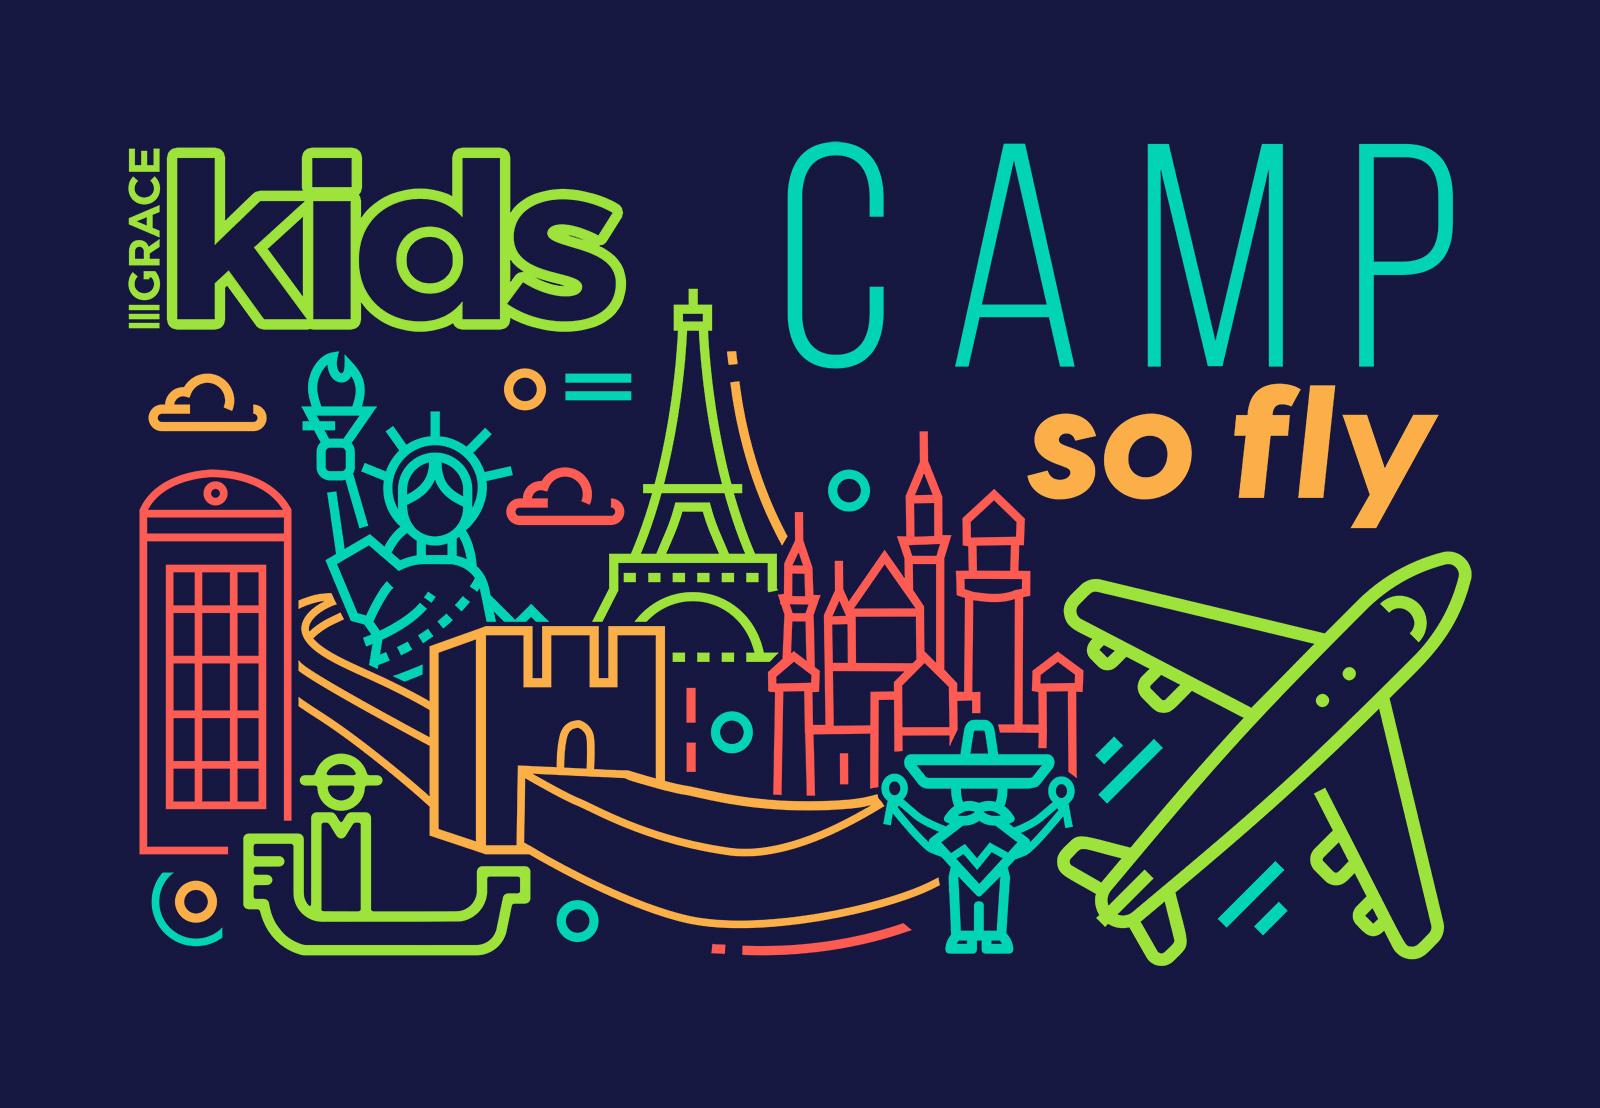 Camp sofly logo  screen res  color  navybg